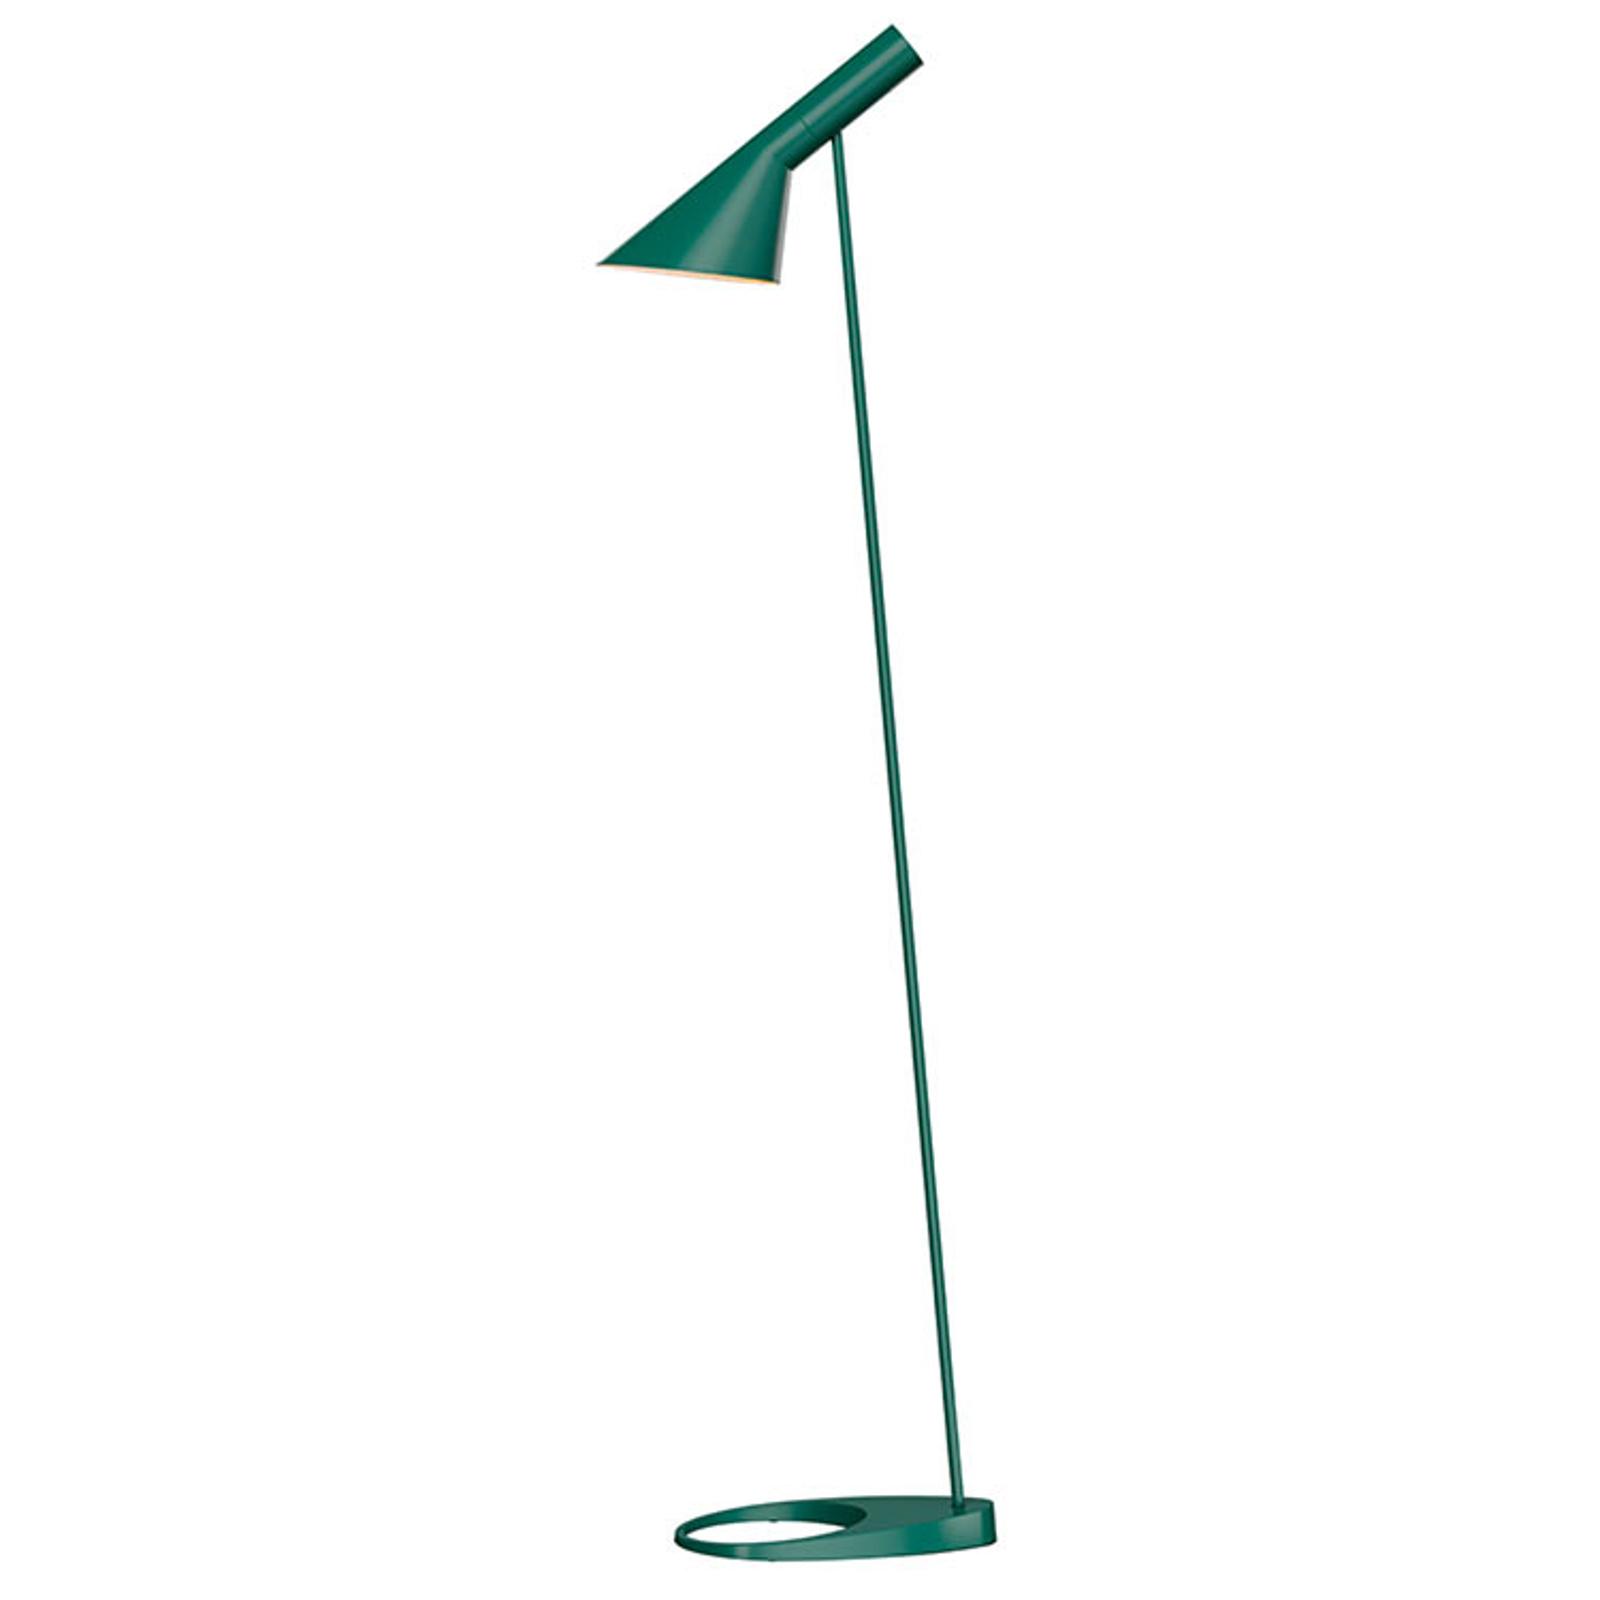 Louis Poulsen AJ - vloerlamp, donkergroen